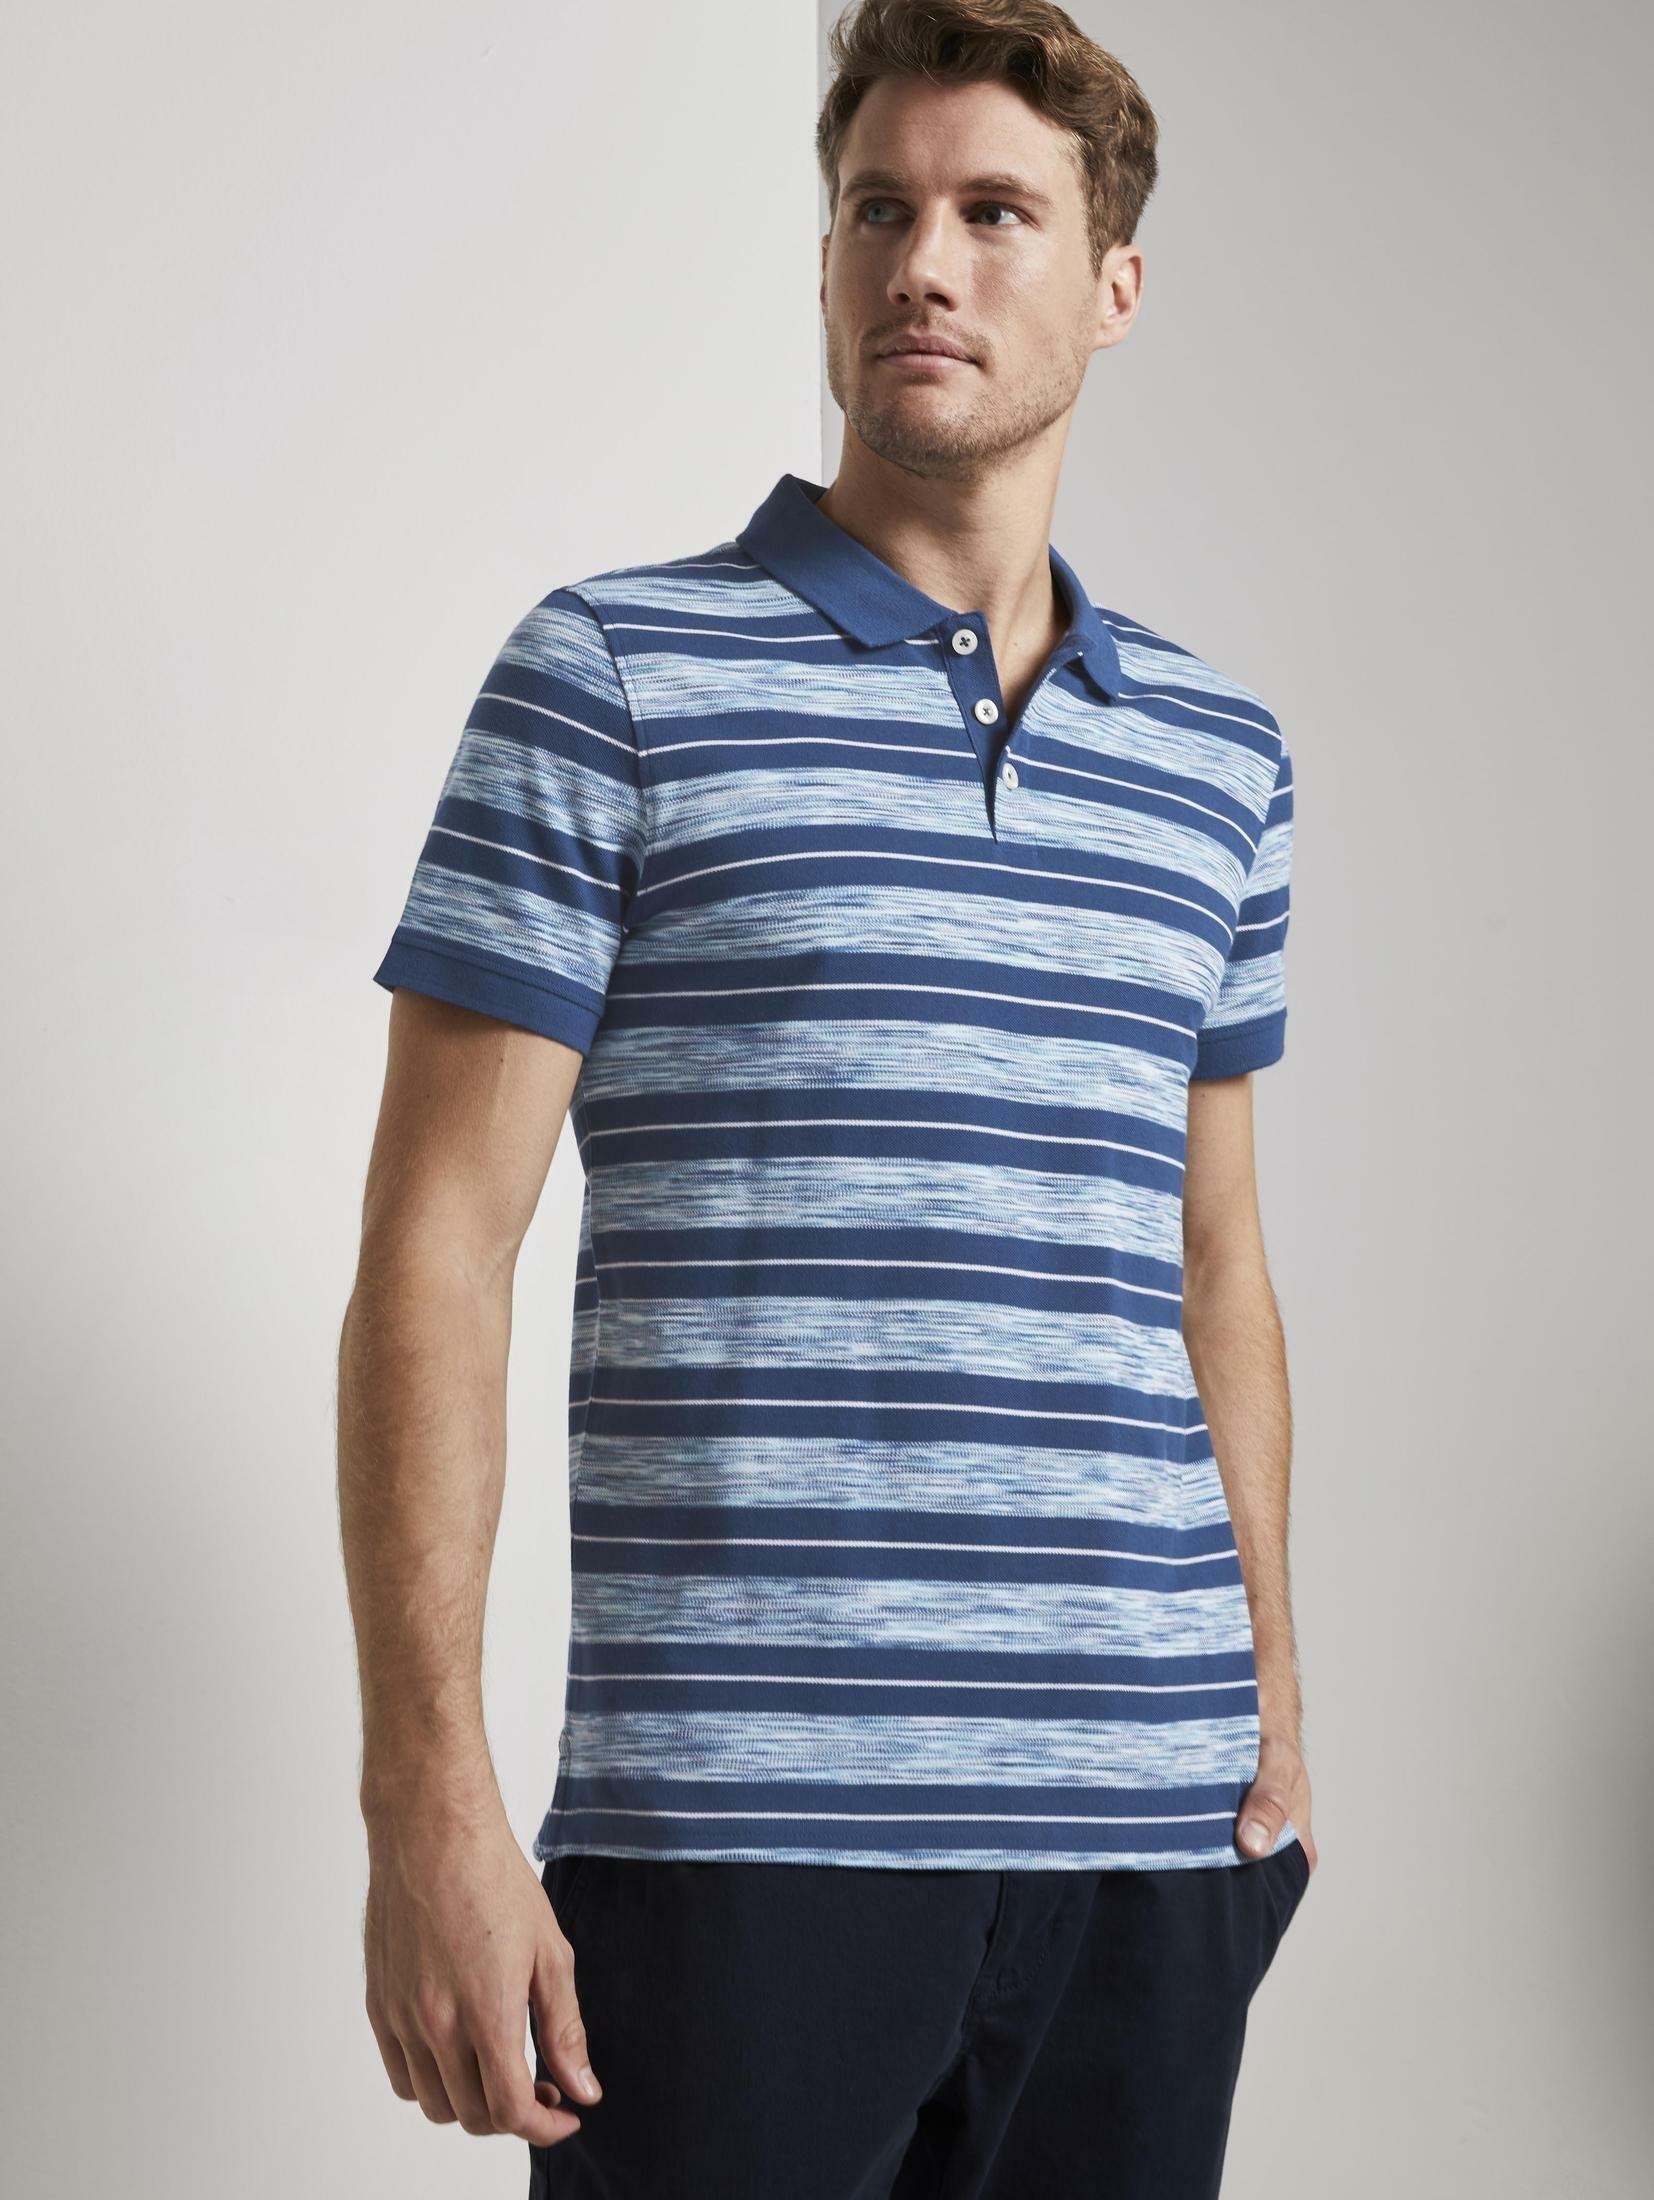 Tom Tailor poloshirt »Poloshirt mit Streifenmuster« voordelig en veilig online kopen